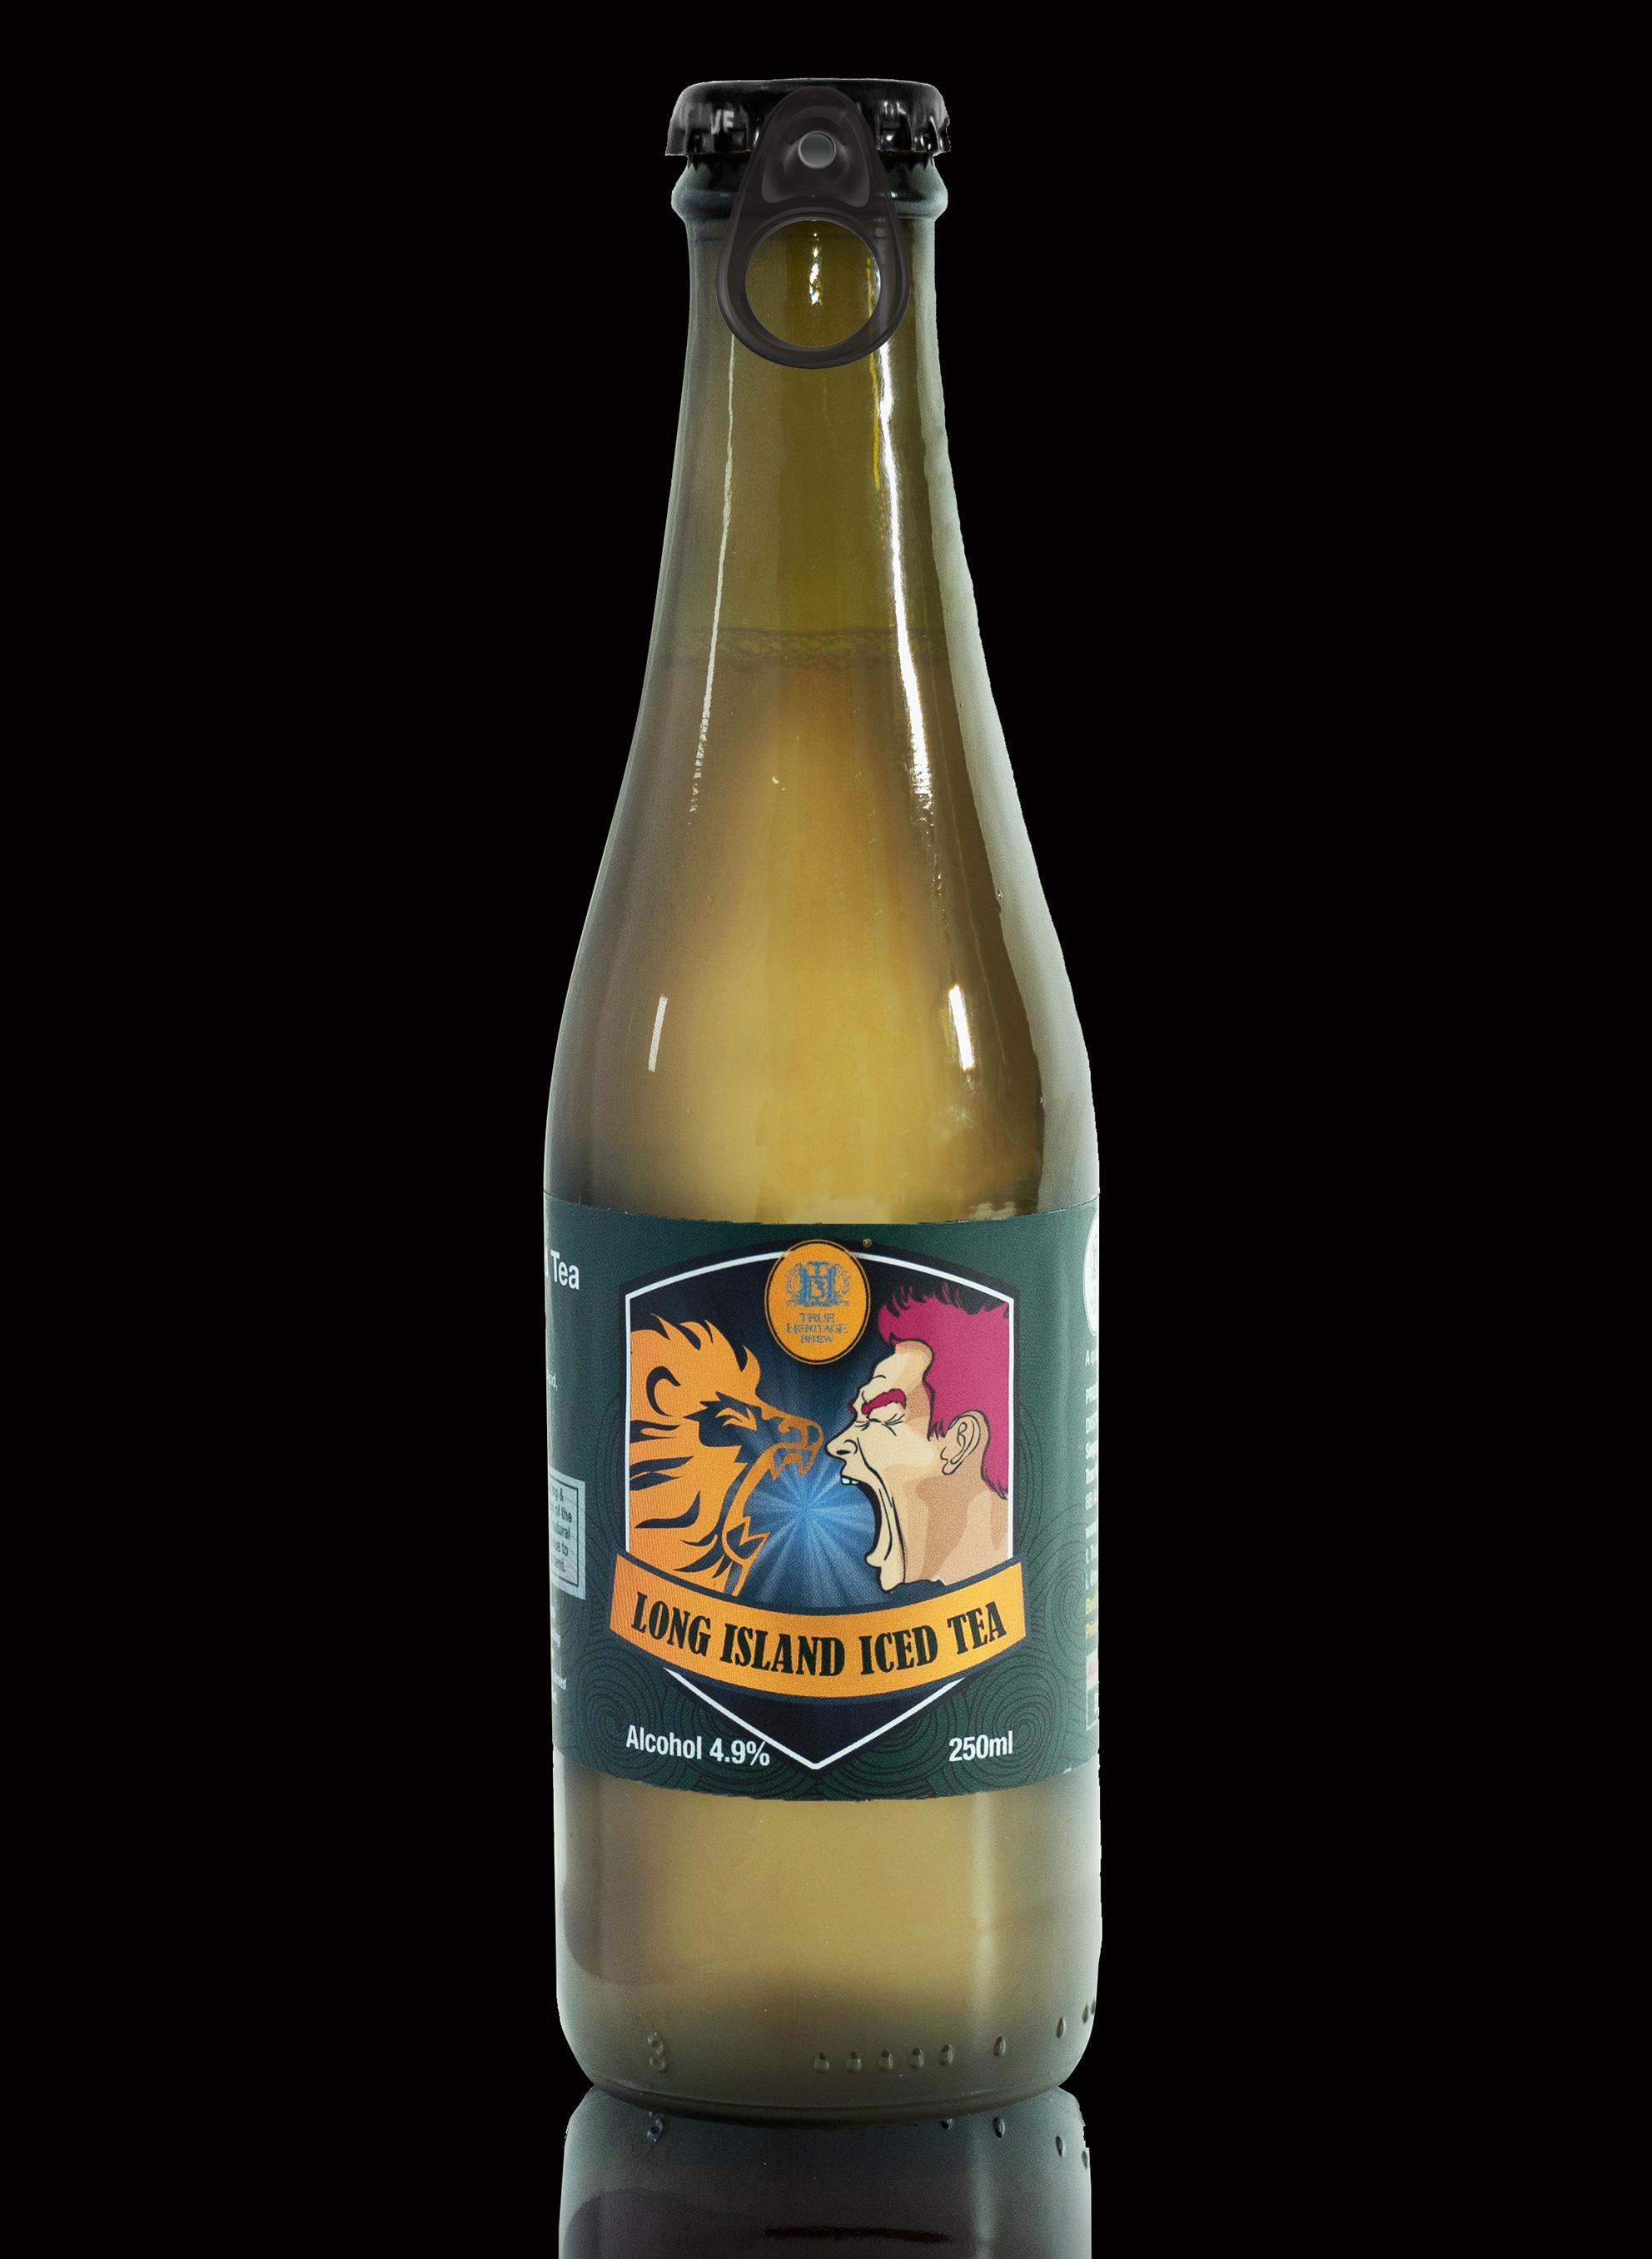 RTD_Long Island Iced Tea_glass bottle